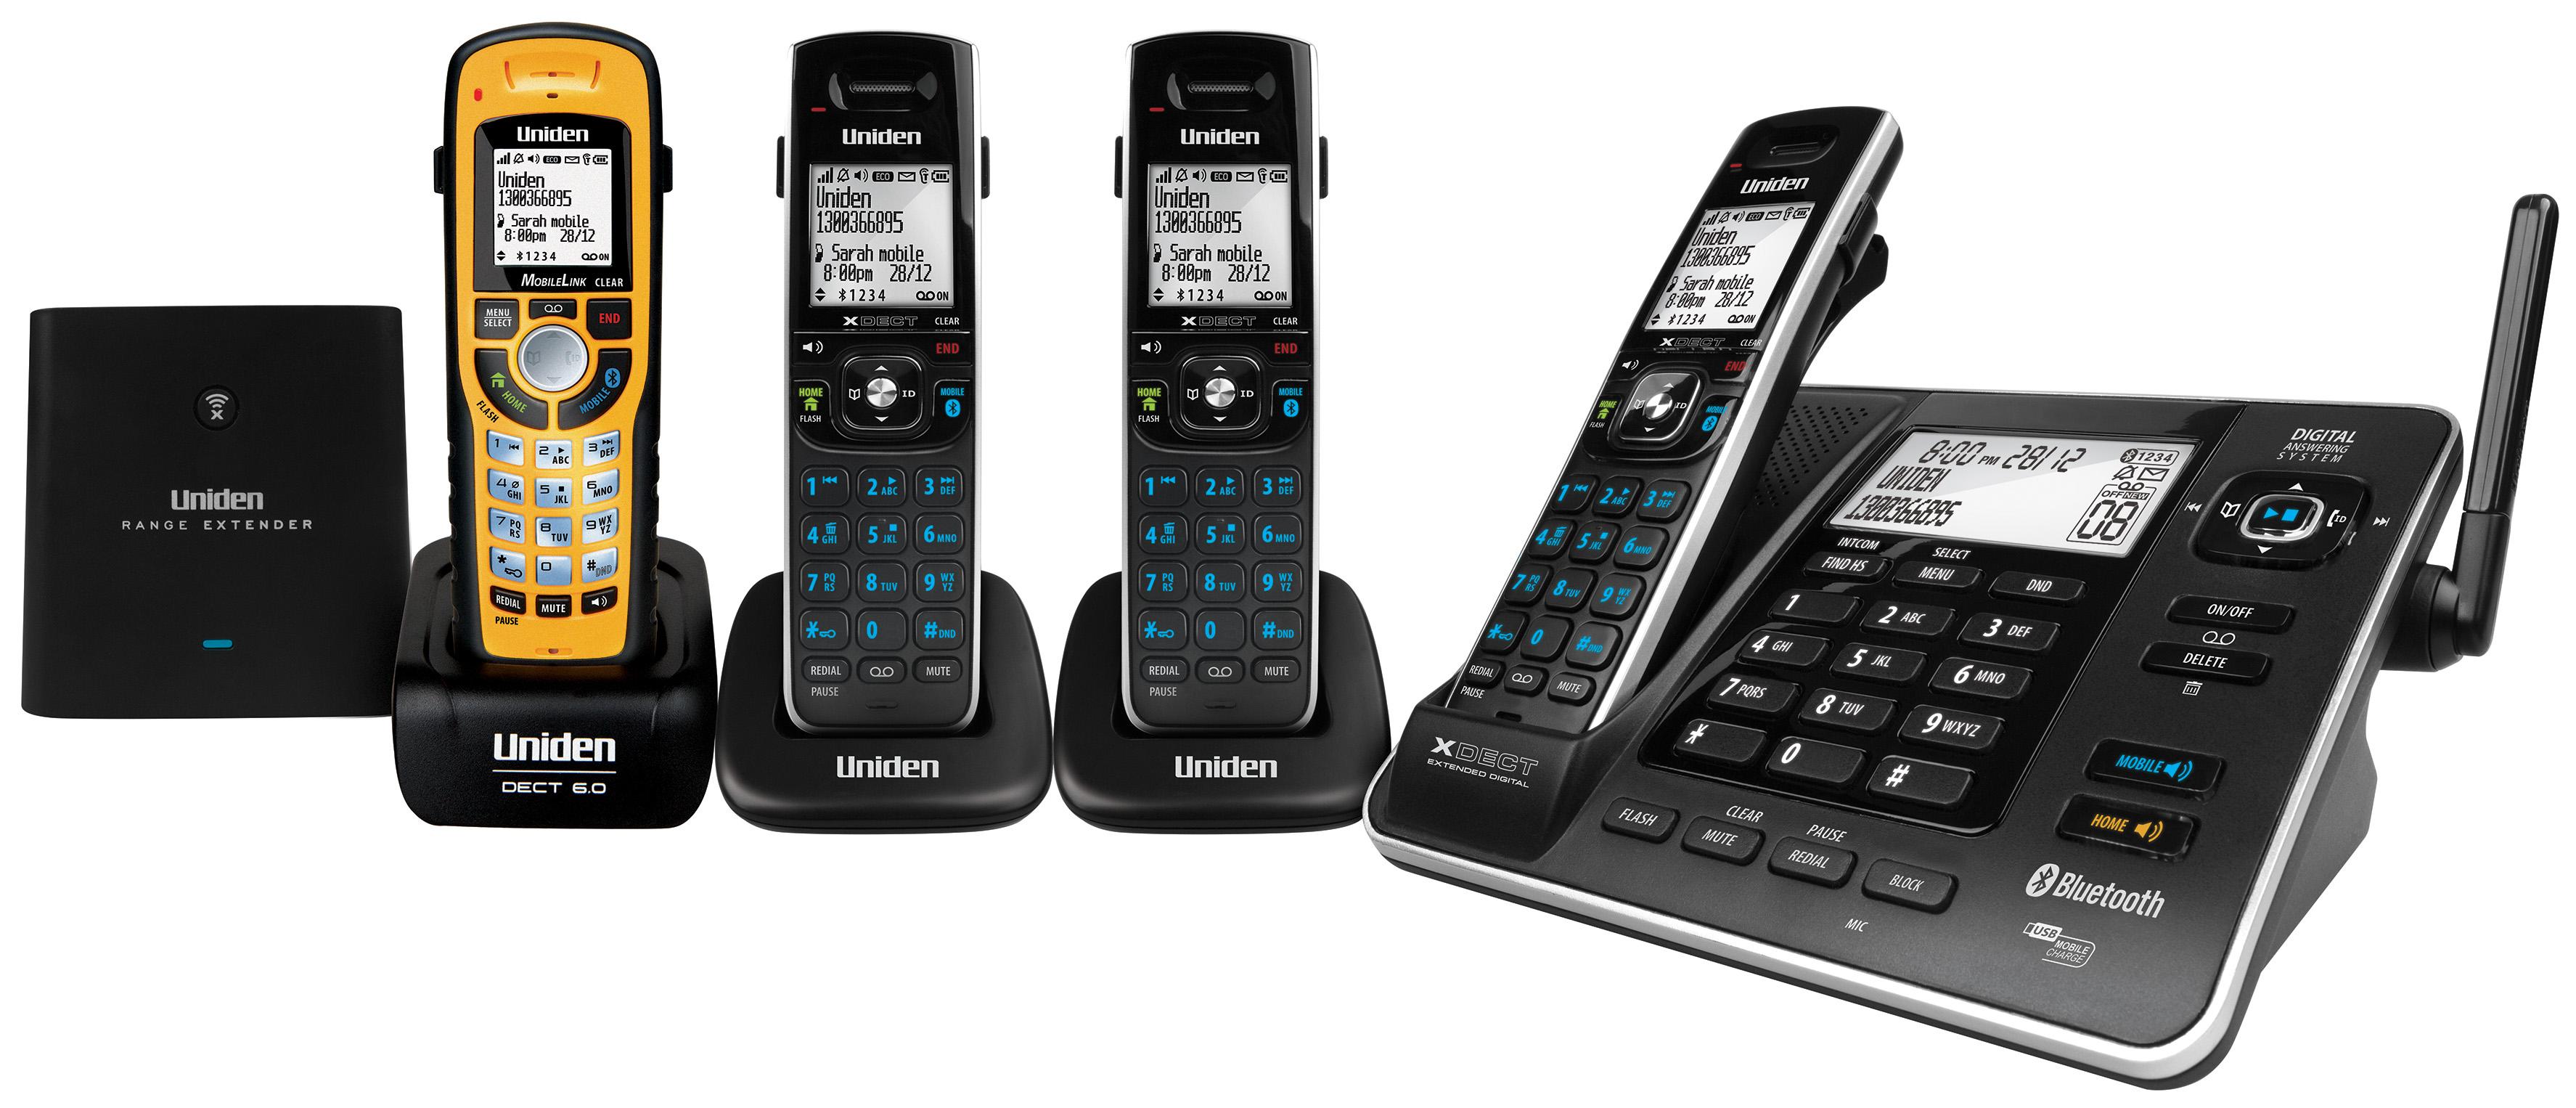 XDECT 8355+3WPR